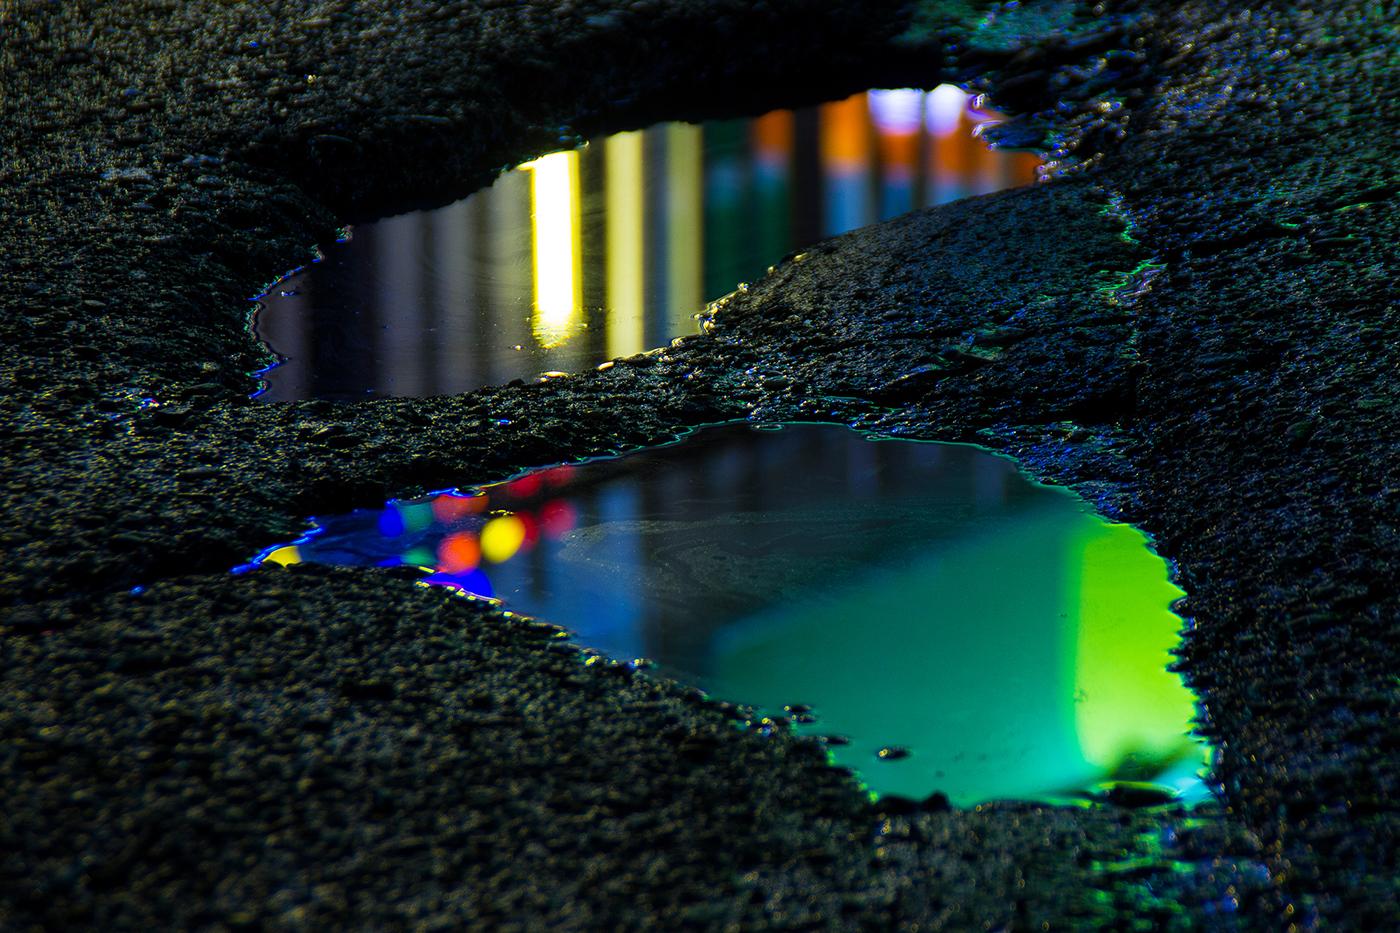 wet-neon-local-preacher-photography-1.jpg